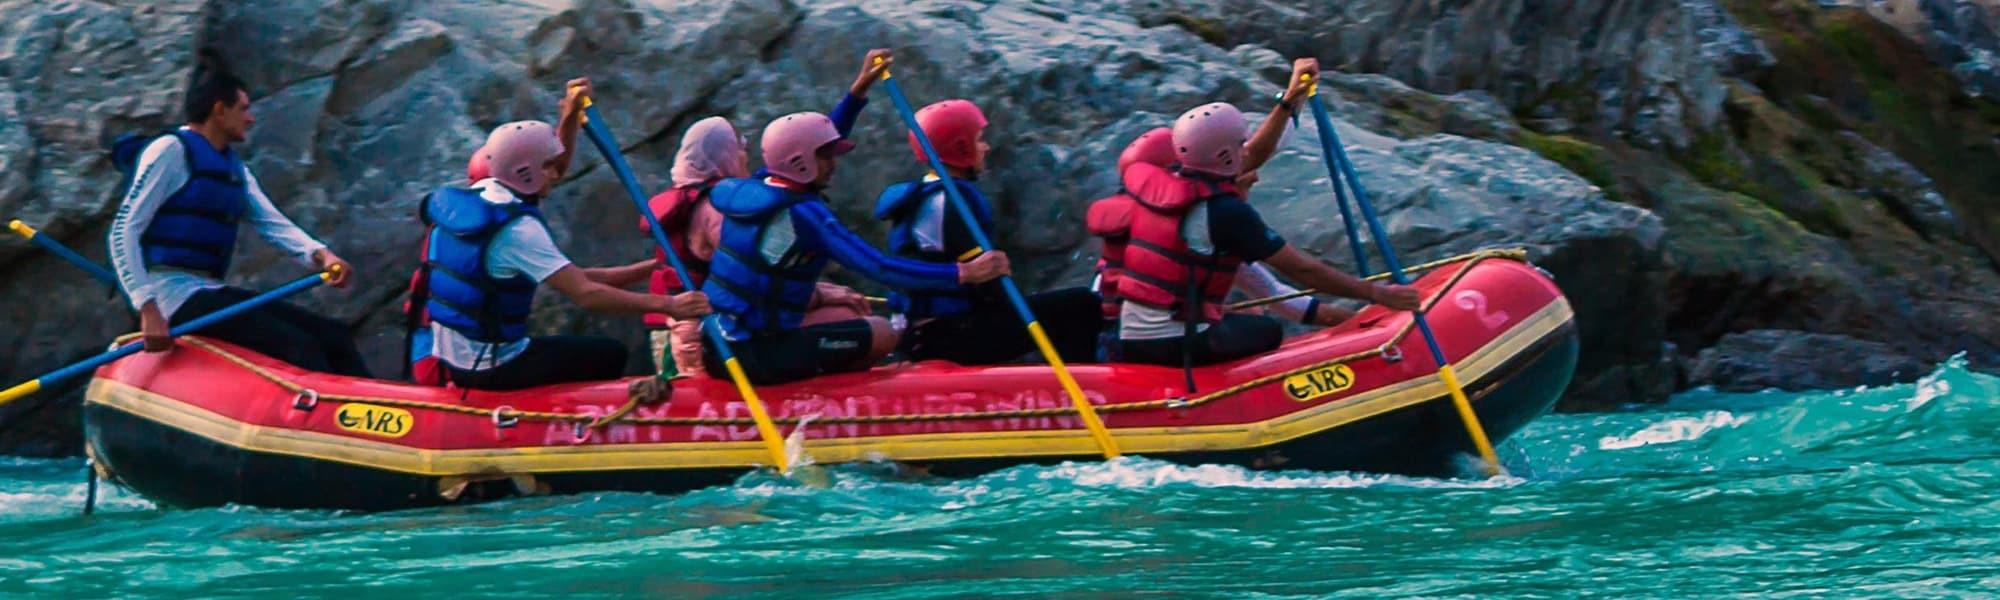 White River rafting in Barapole River